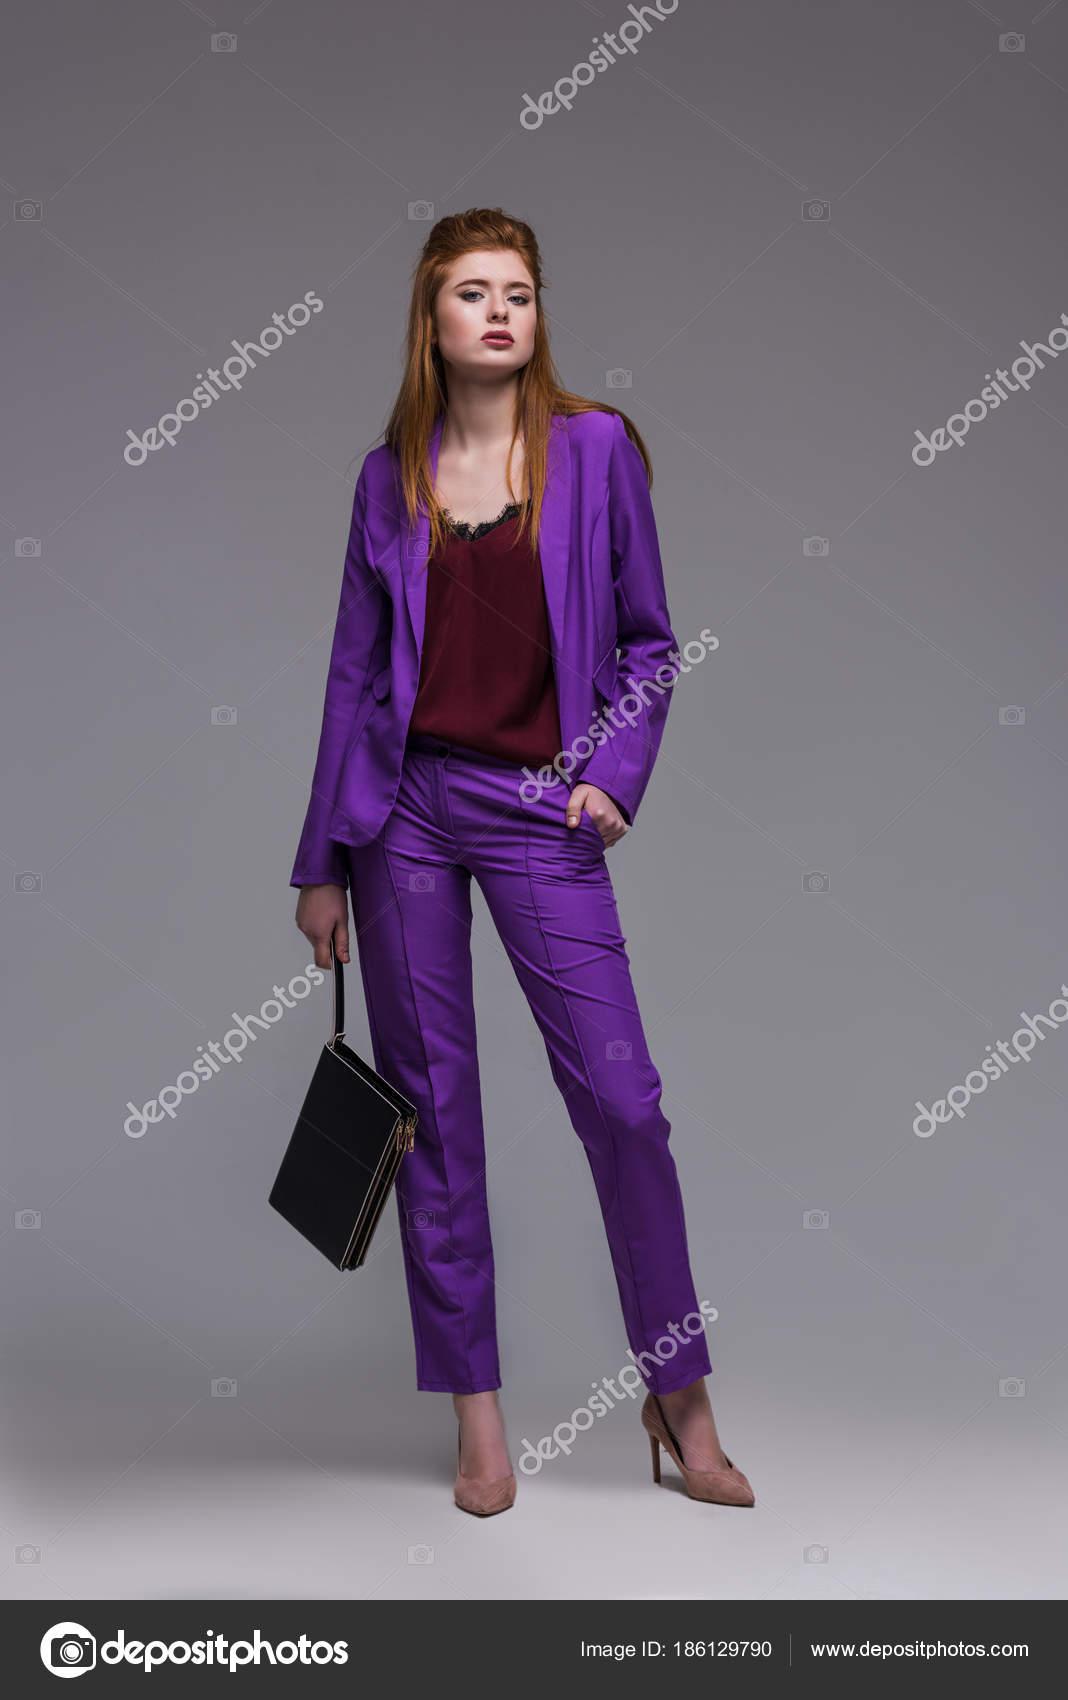 Modelo Moda Mujer Joven Traje Formal Con Bolso Aislado Gris — Fotos ...